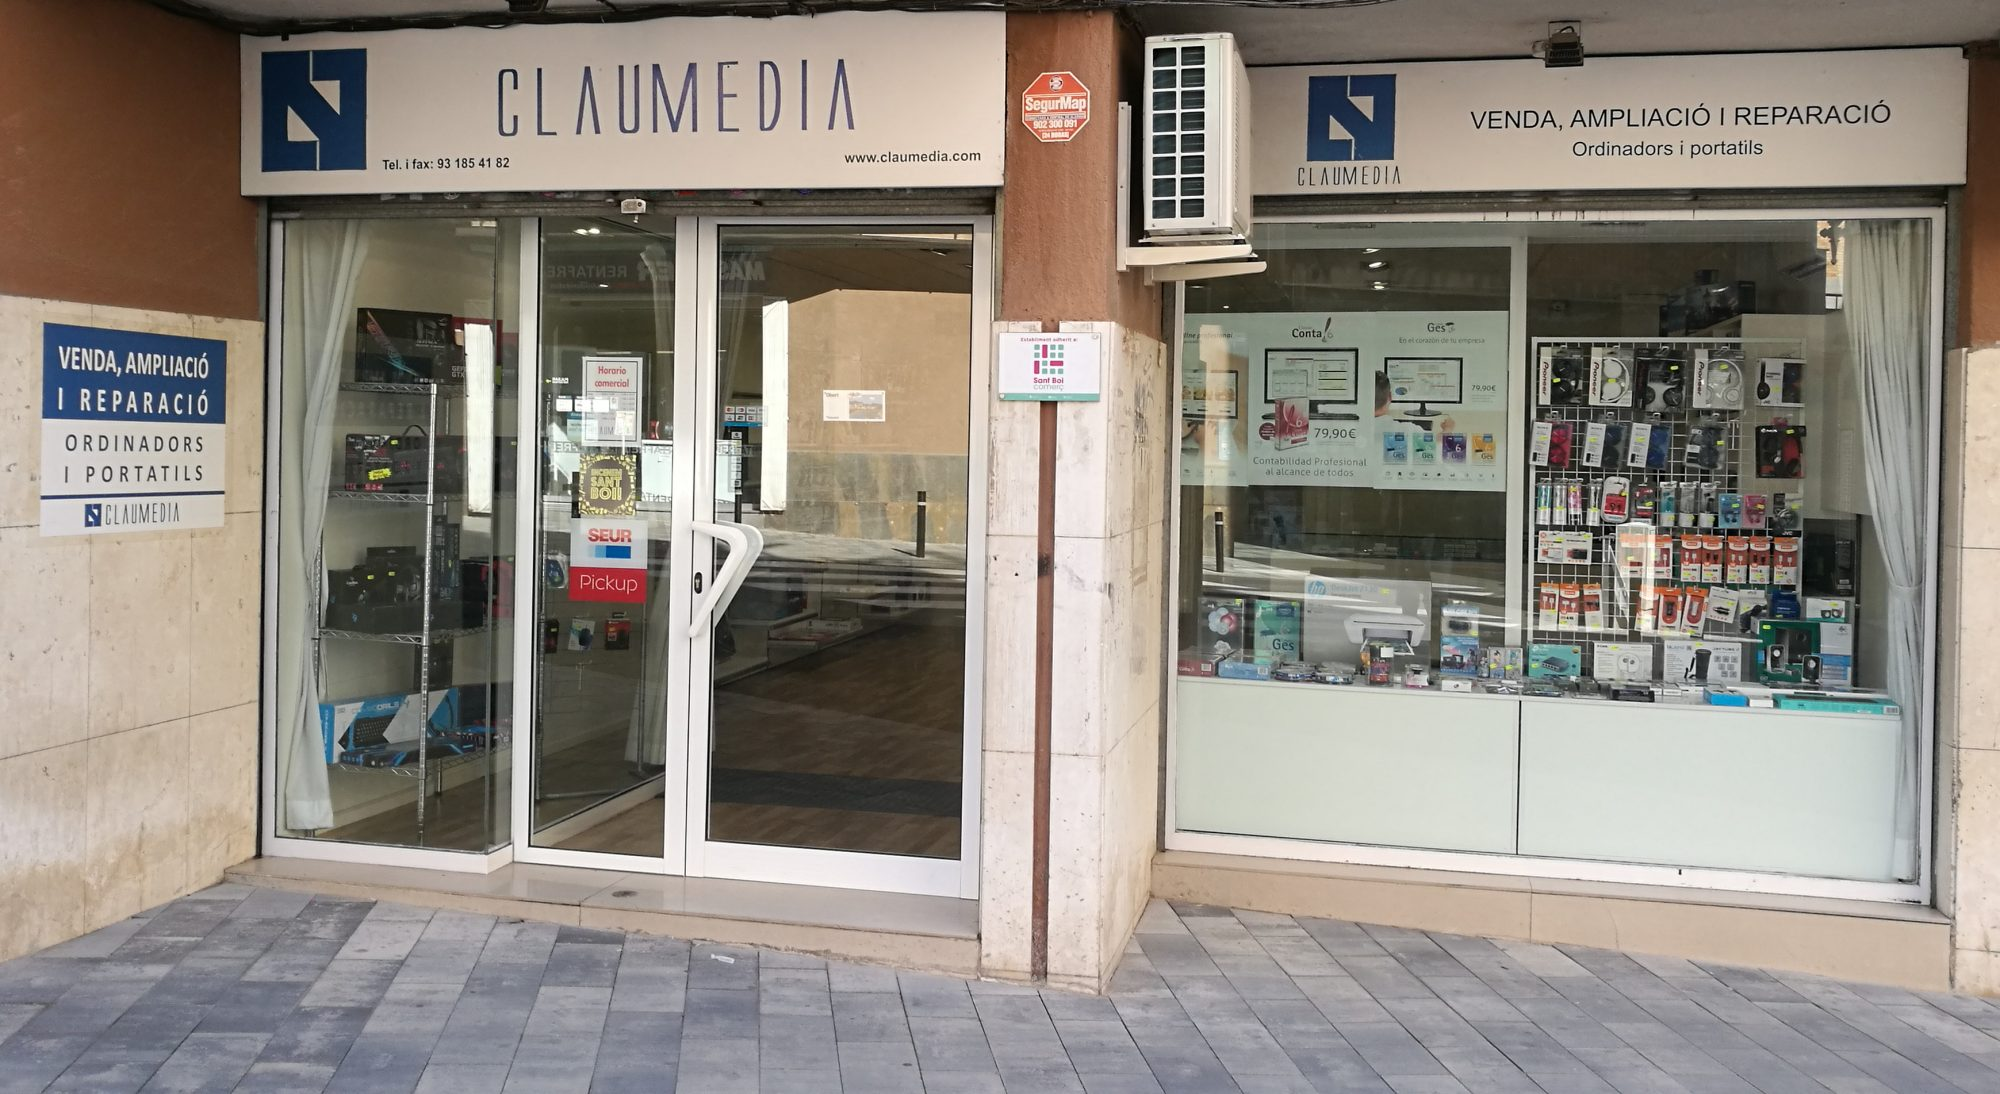 Claumedia